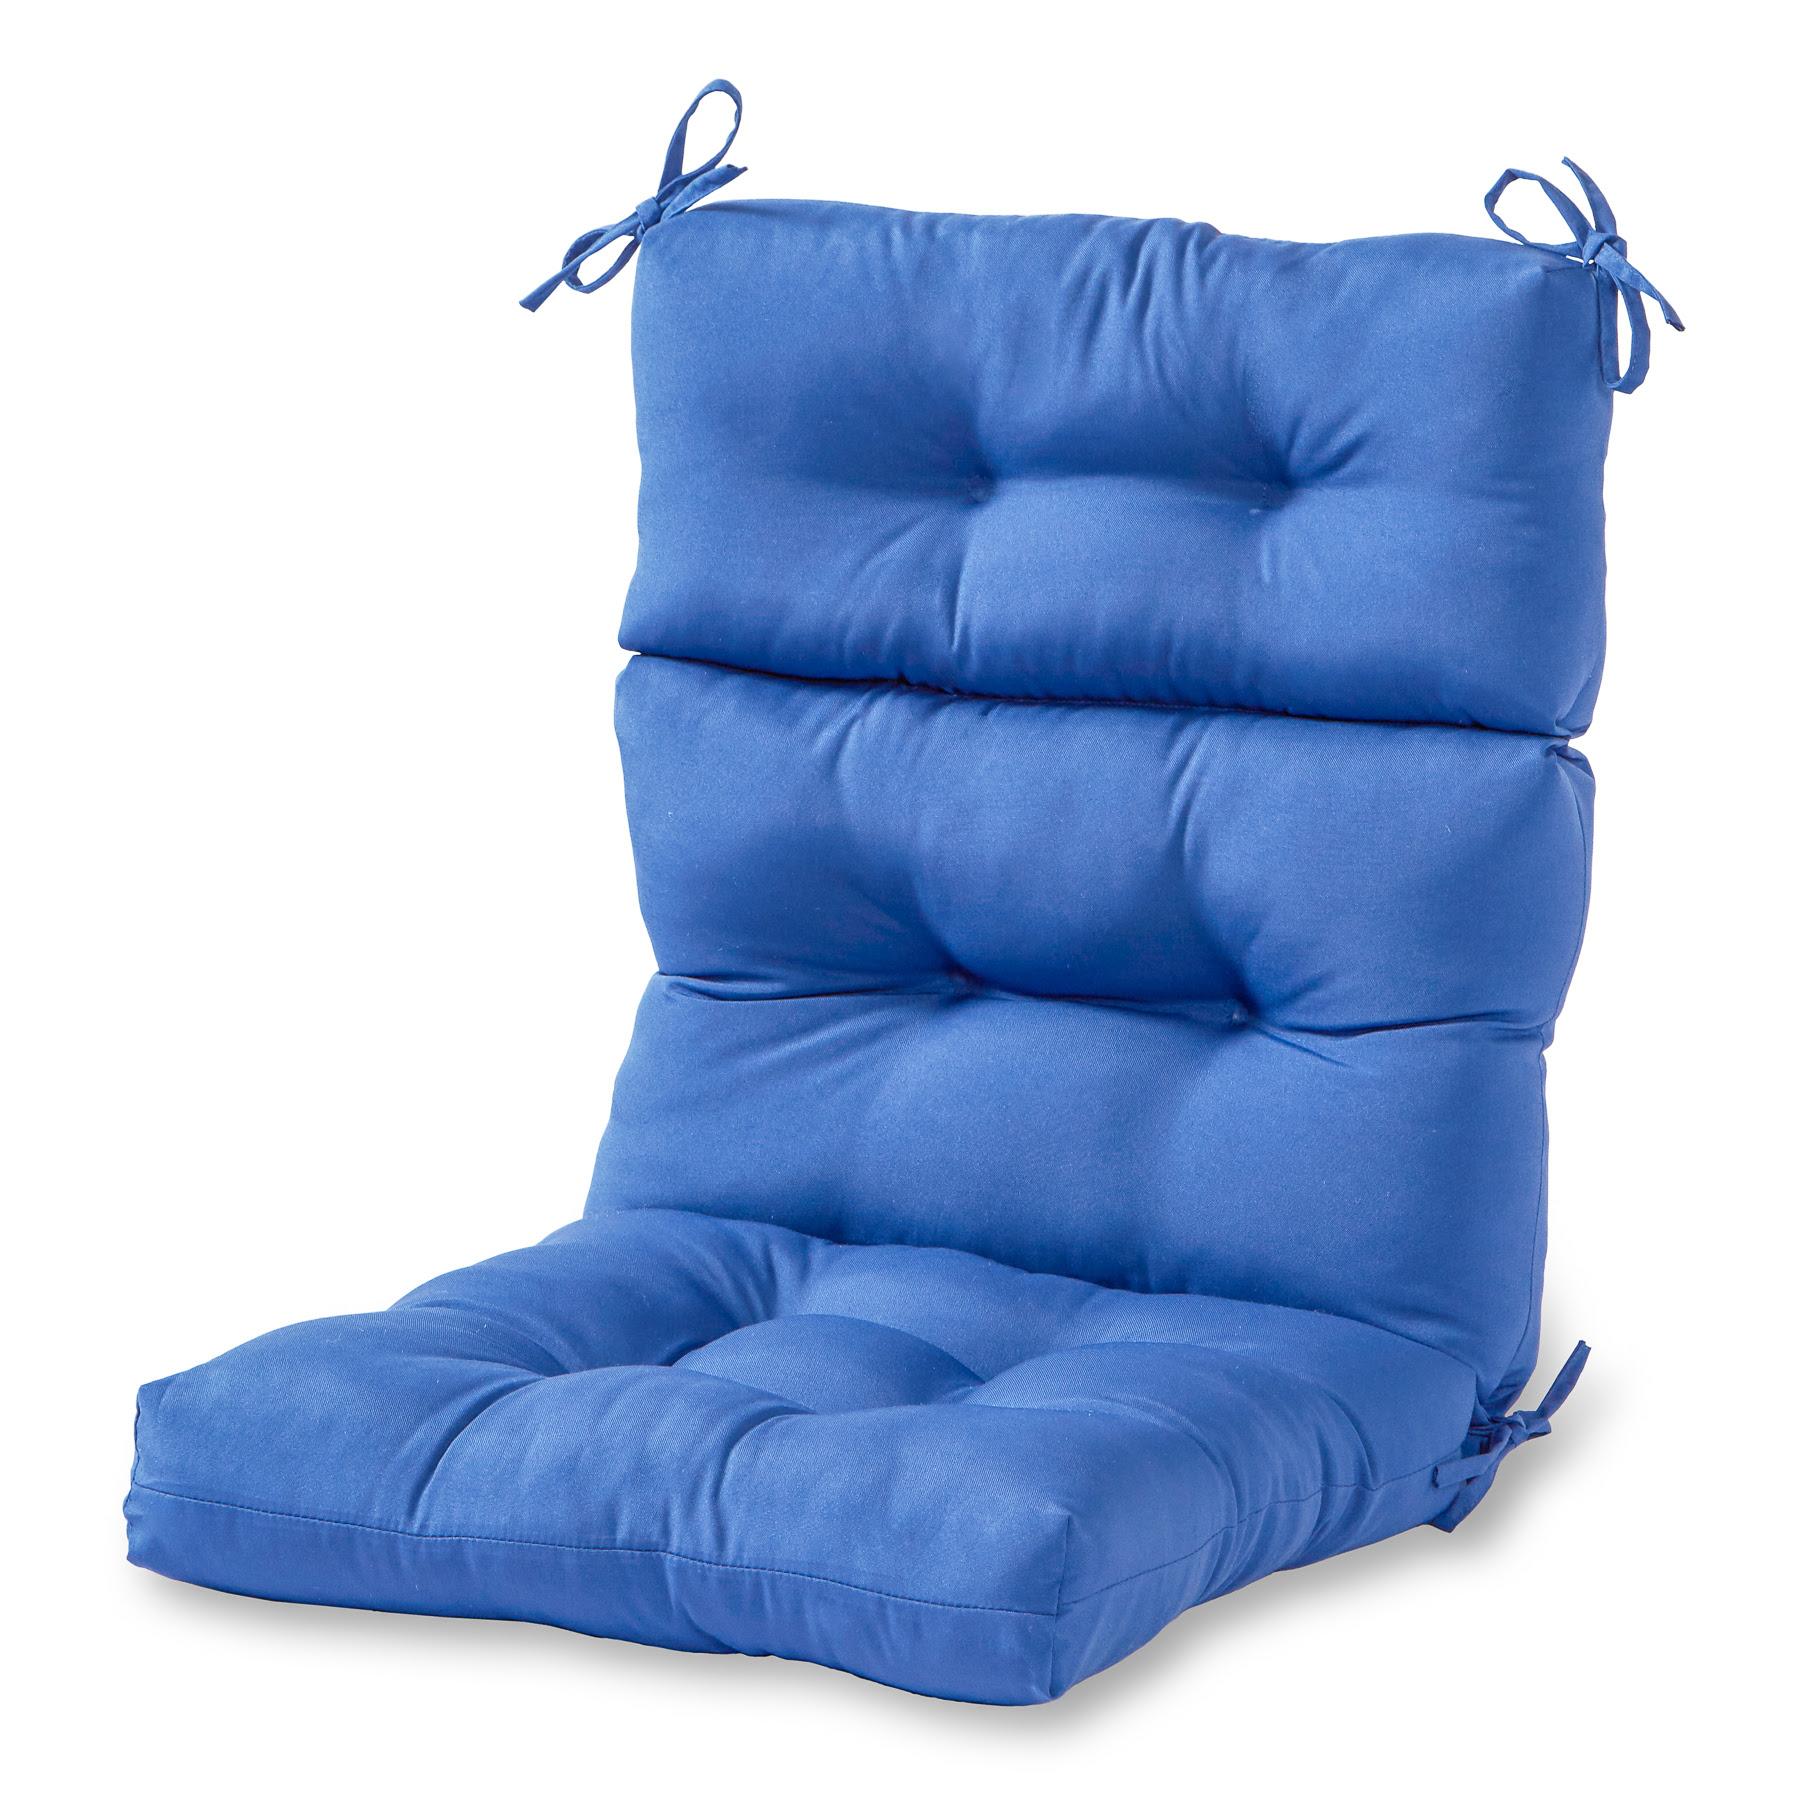 Greendale Home Fashions Outdoor High Back Chair Cushion ...